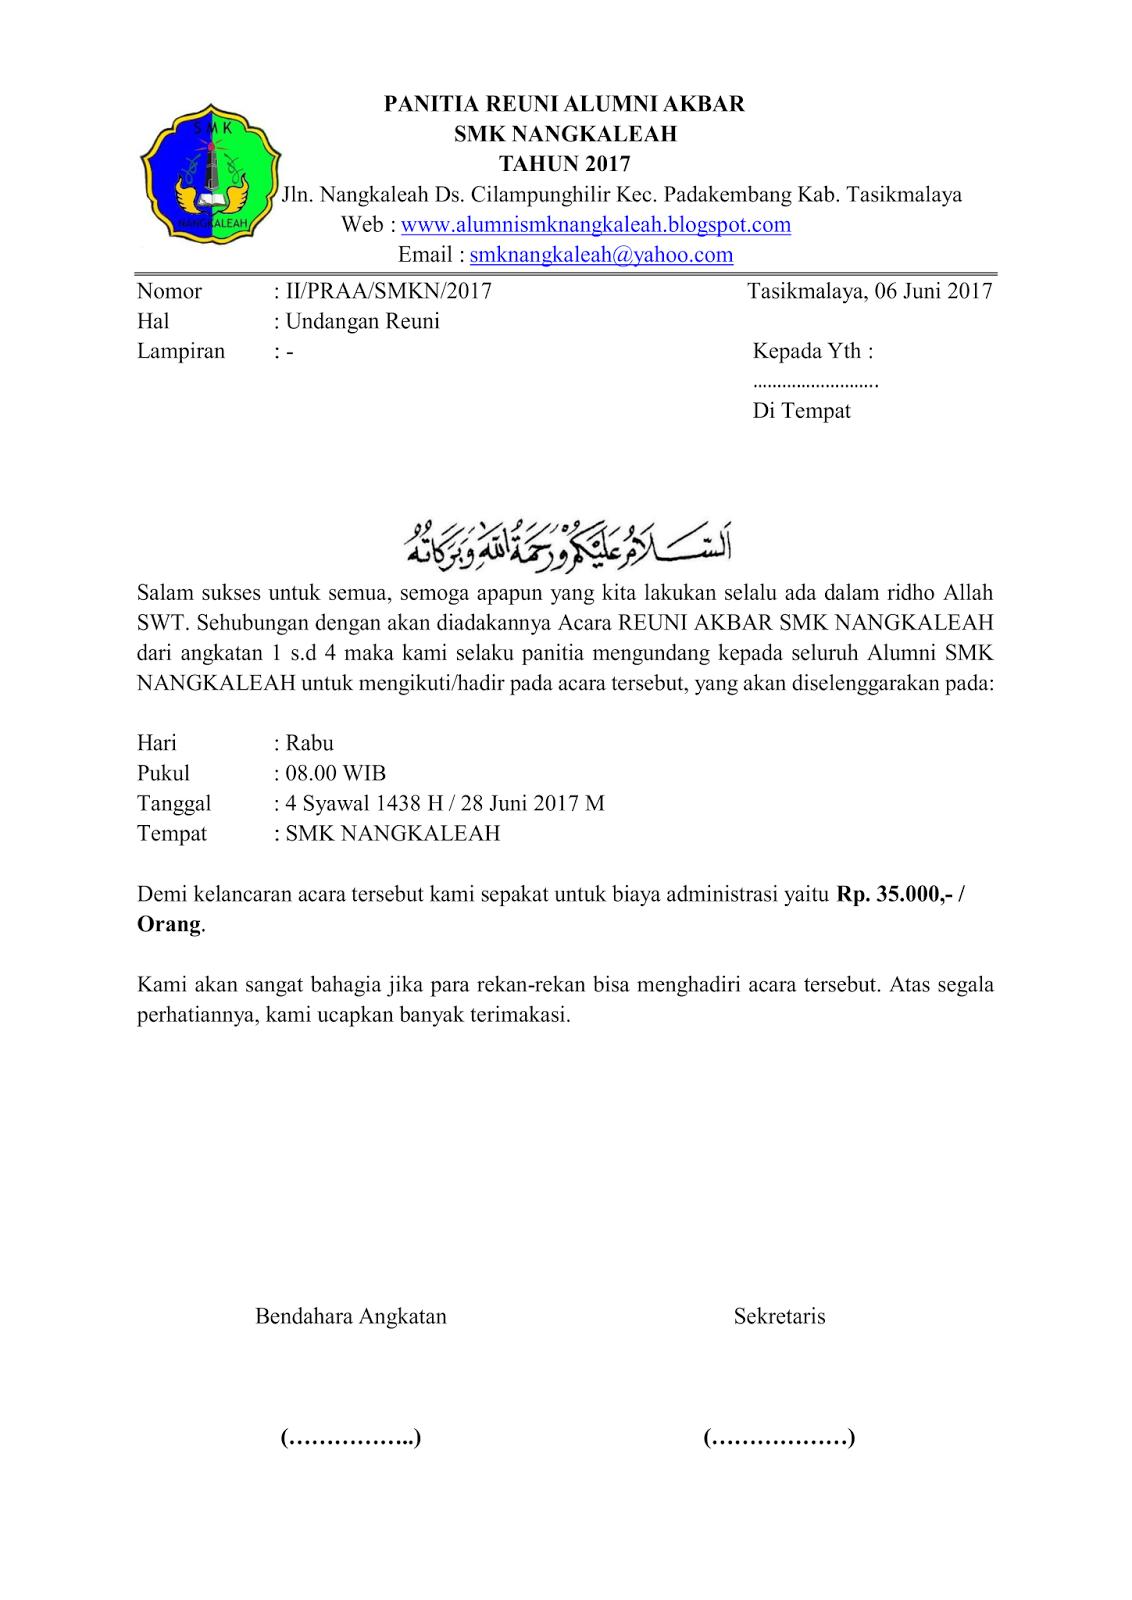 Surat Undangan Reuini Smk Nangkaleah Alumni Smk Nangkaleah